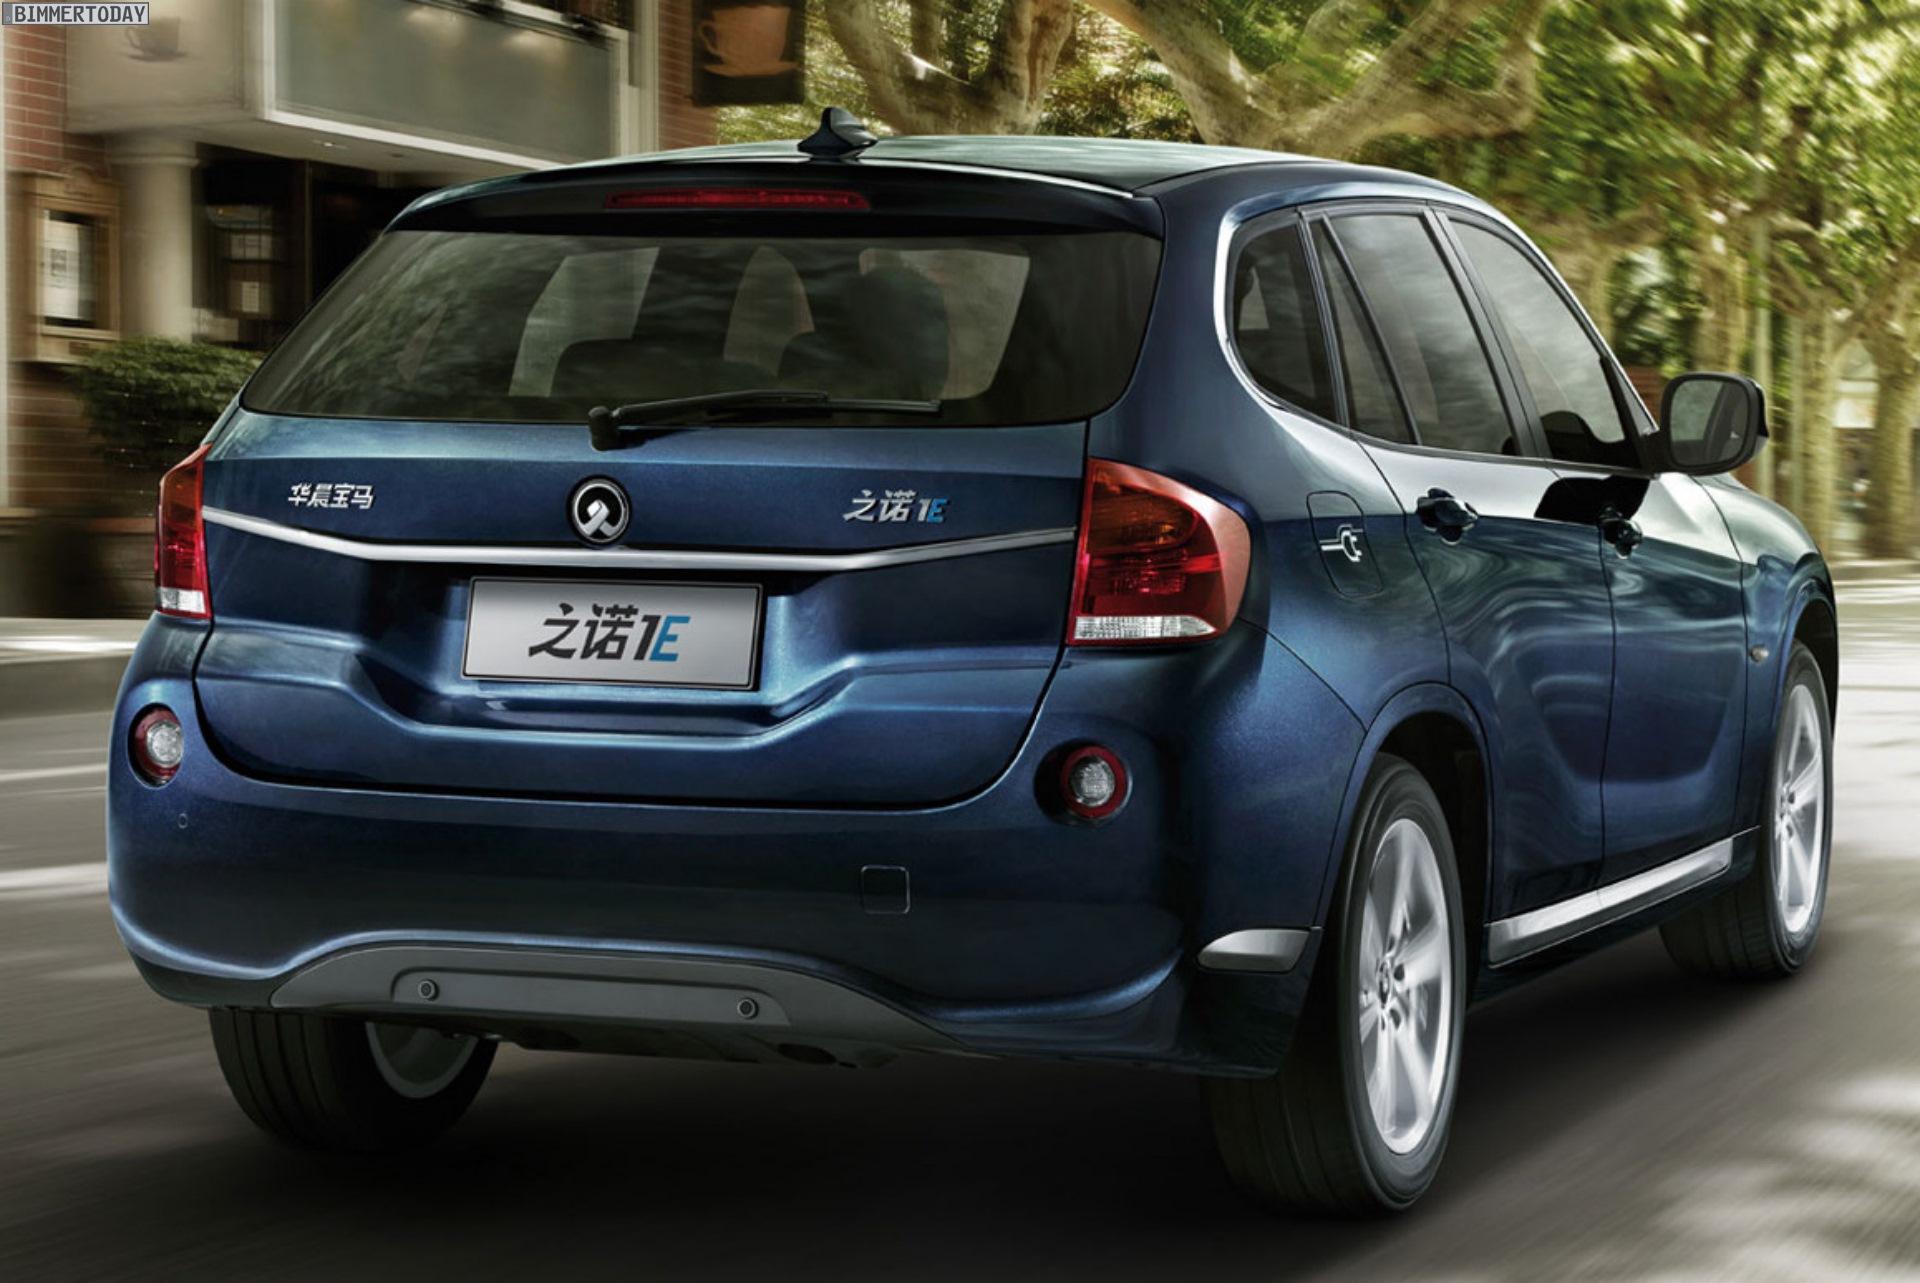 Zinoro 1E BMW X1 China Elektro SUV Guangzhou 2013 09